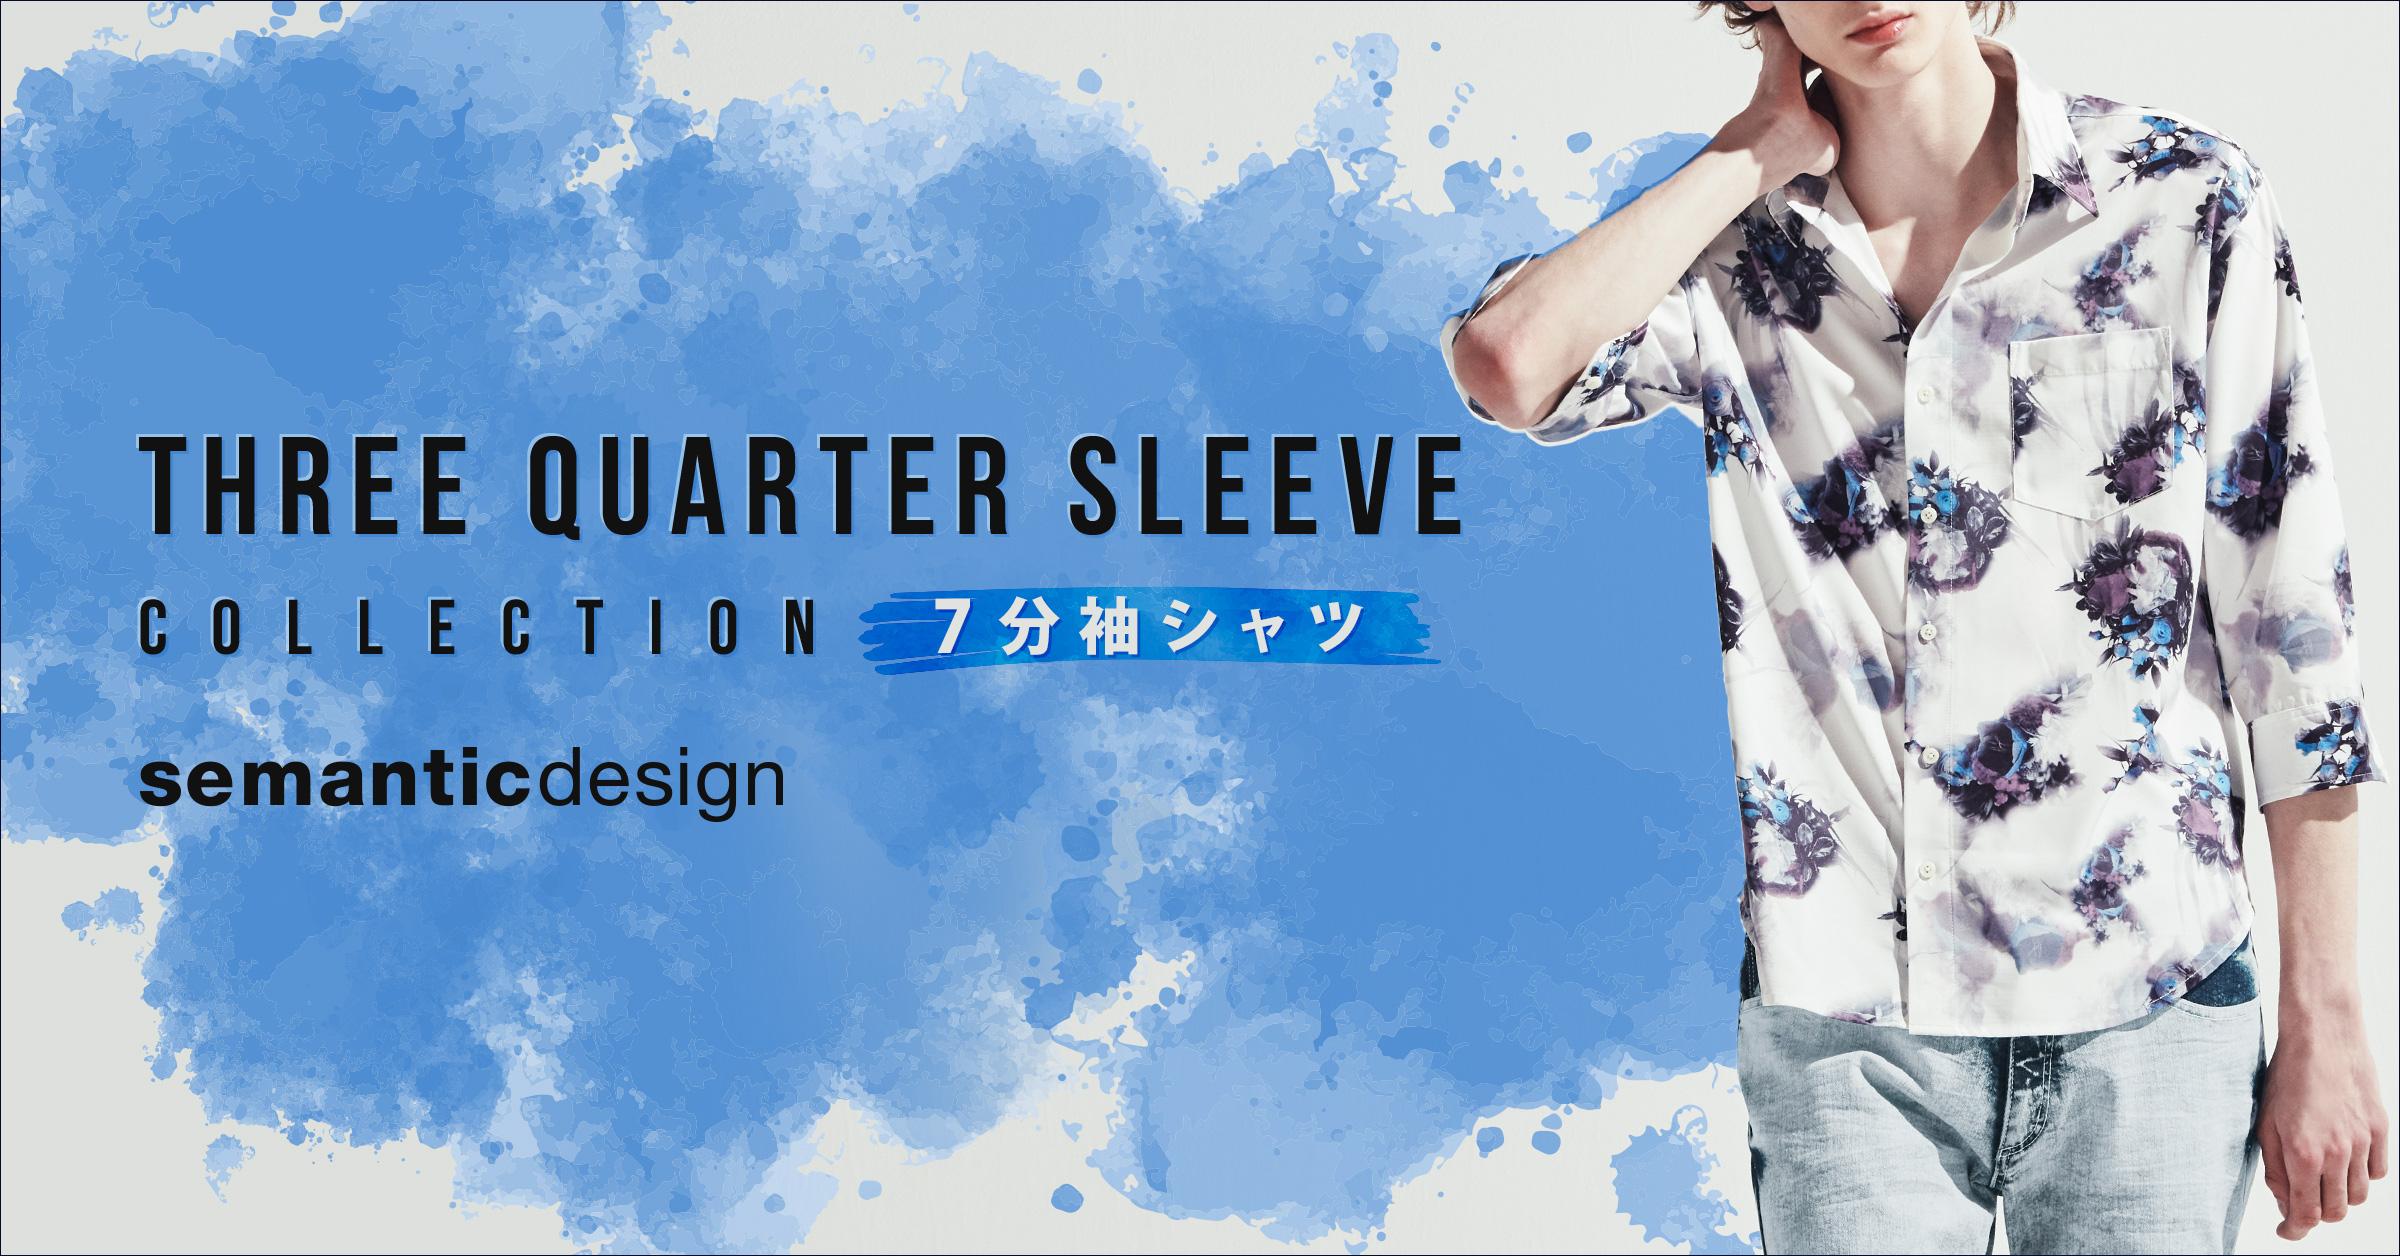 semanticdesign 7分袖カジュアルシャツ collection